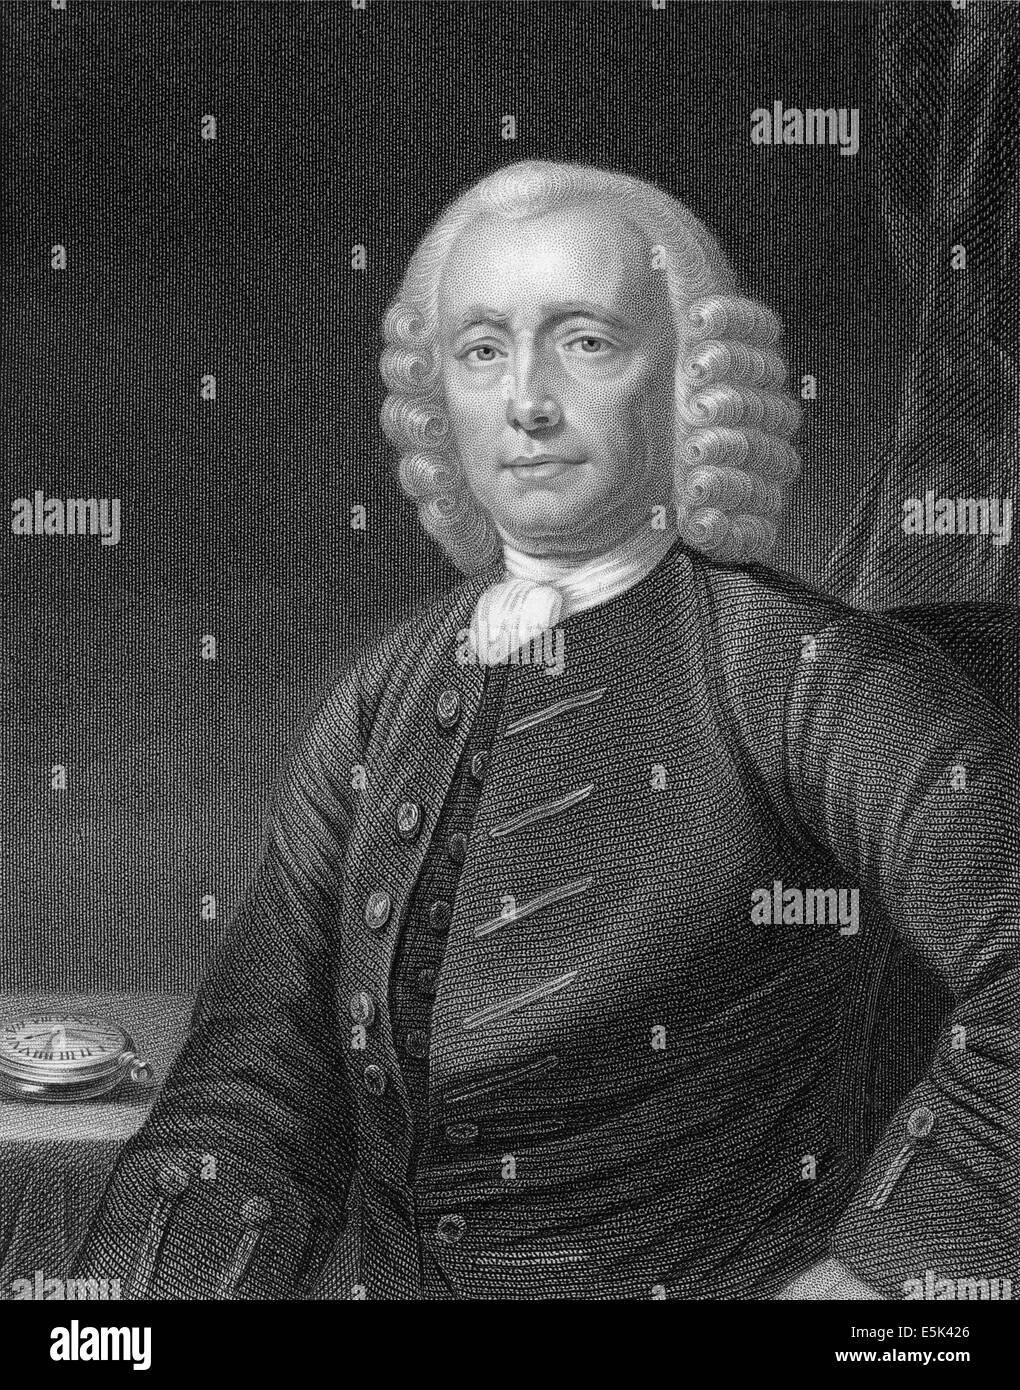 John Harrison, 1693-1776, English carpenter and clockmaker, Stock Photo